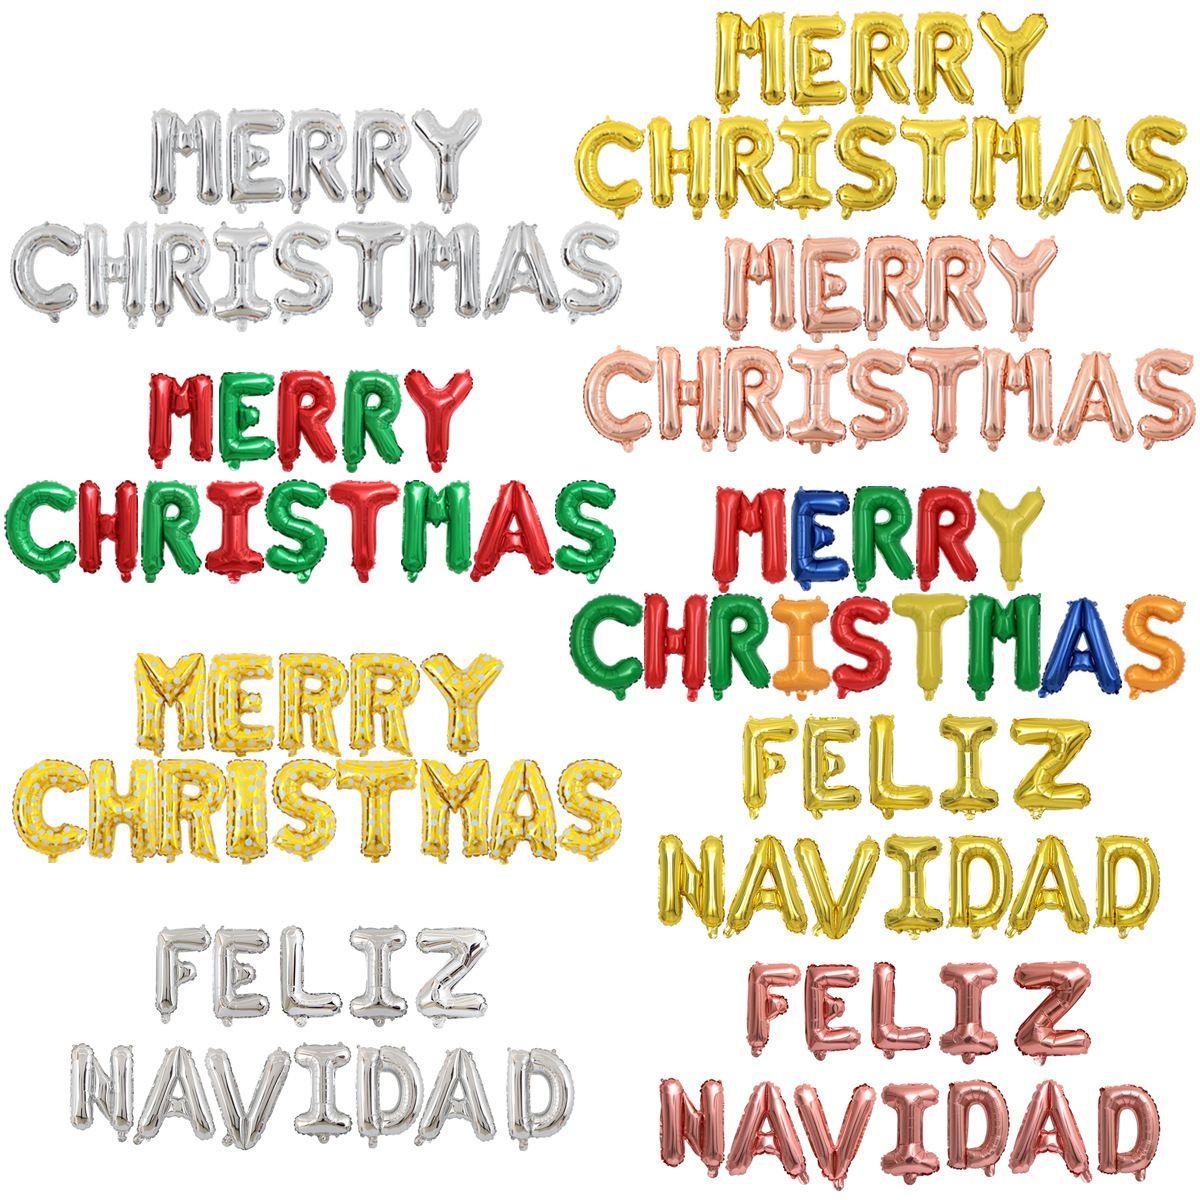 16 İnç İspanyol Merry Christmas Balon mutlu noeller Harf Alüminyum Film Balon Tatil Dekorasyon Topu